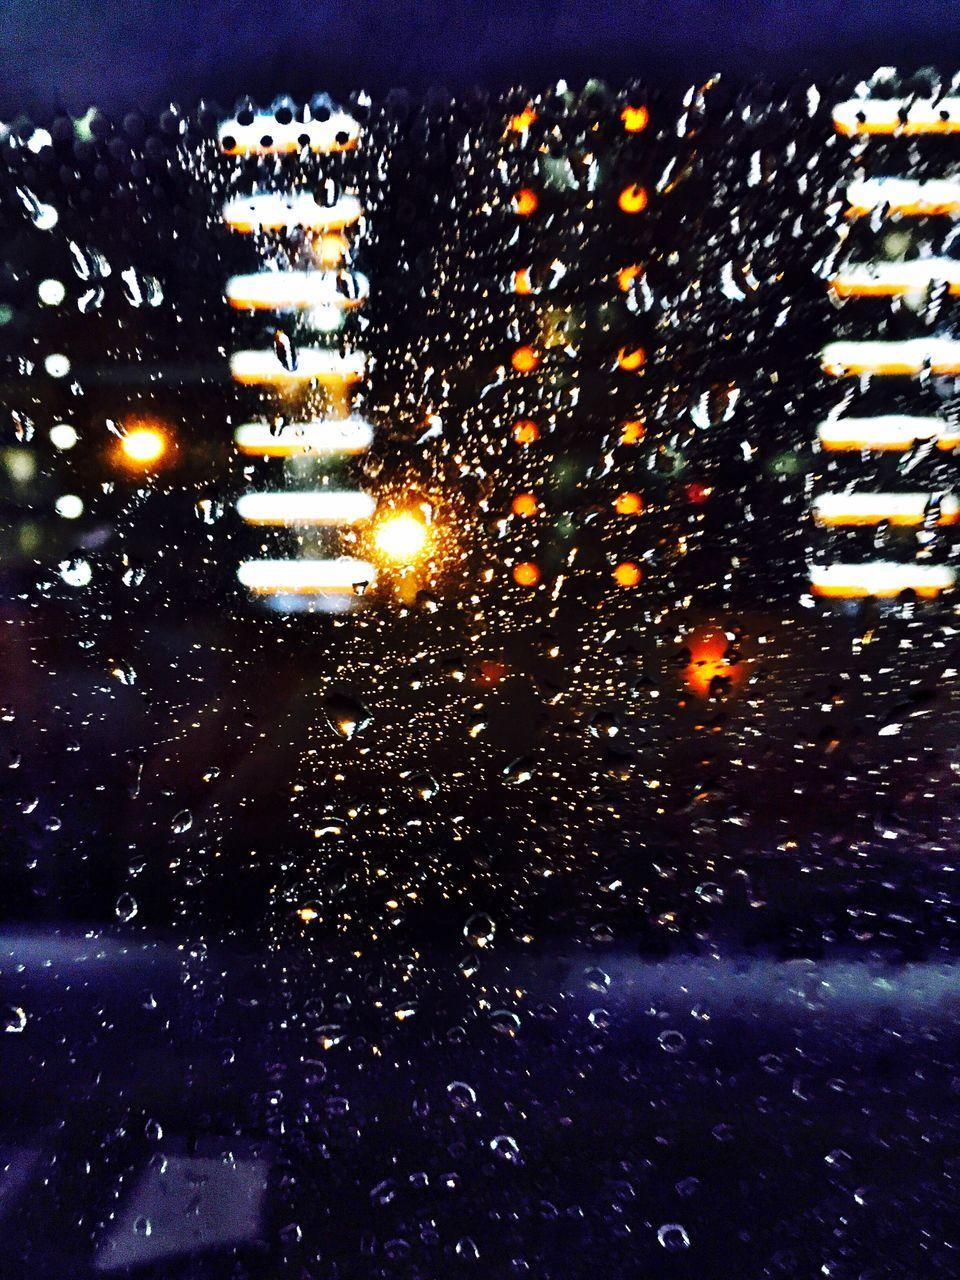 illuminated, weather, night, wet, no people, raindrop, car, land vehicle, road, water, outdoors, close-up, nature